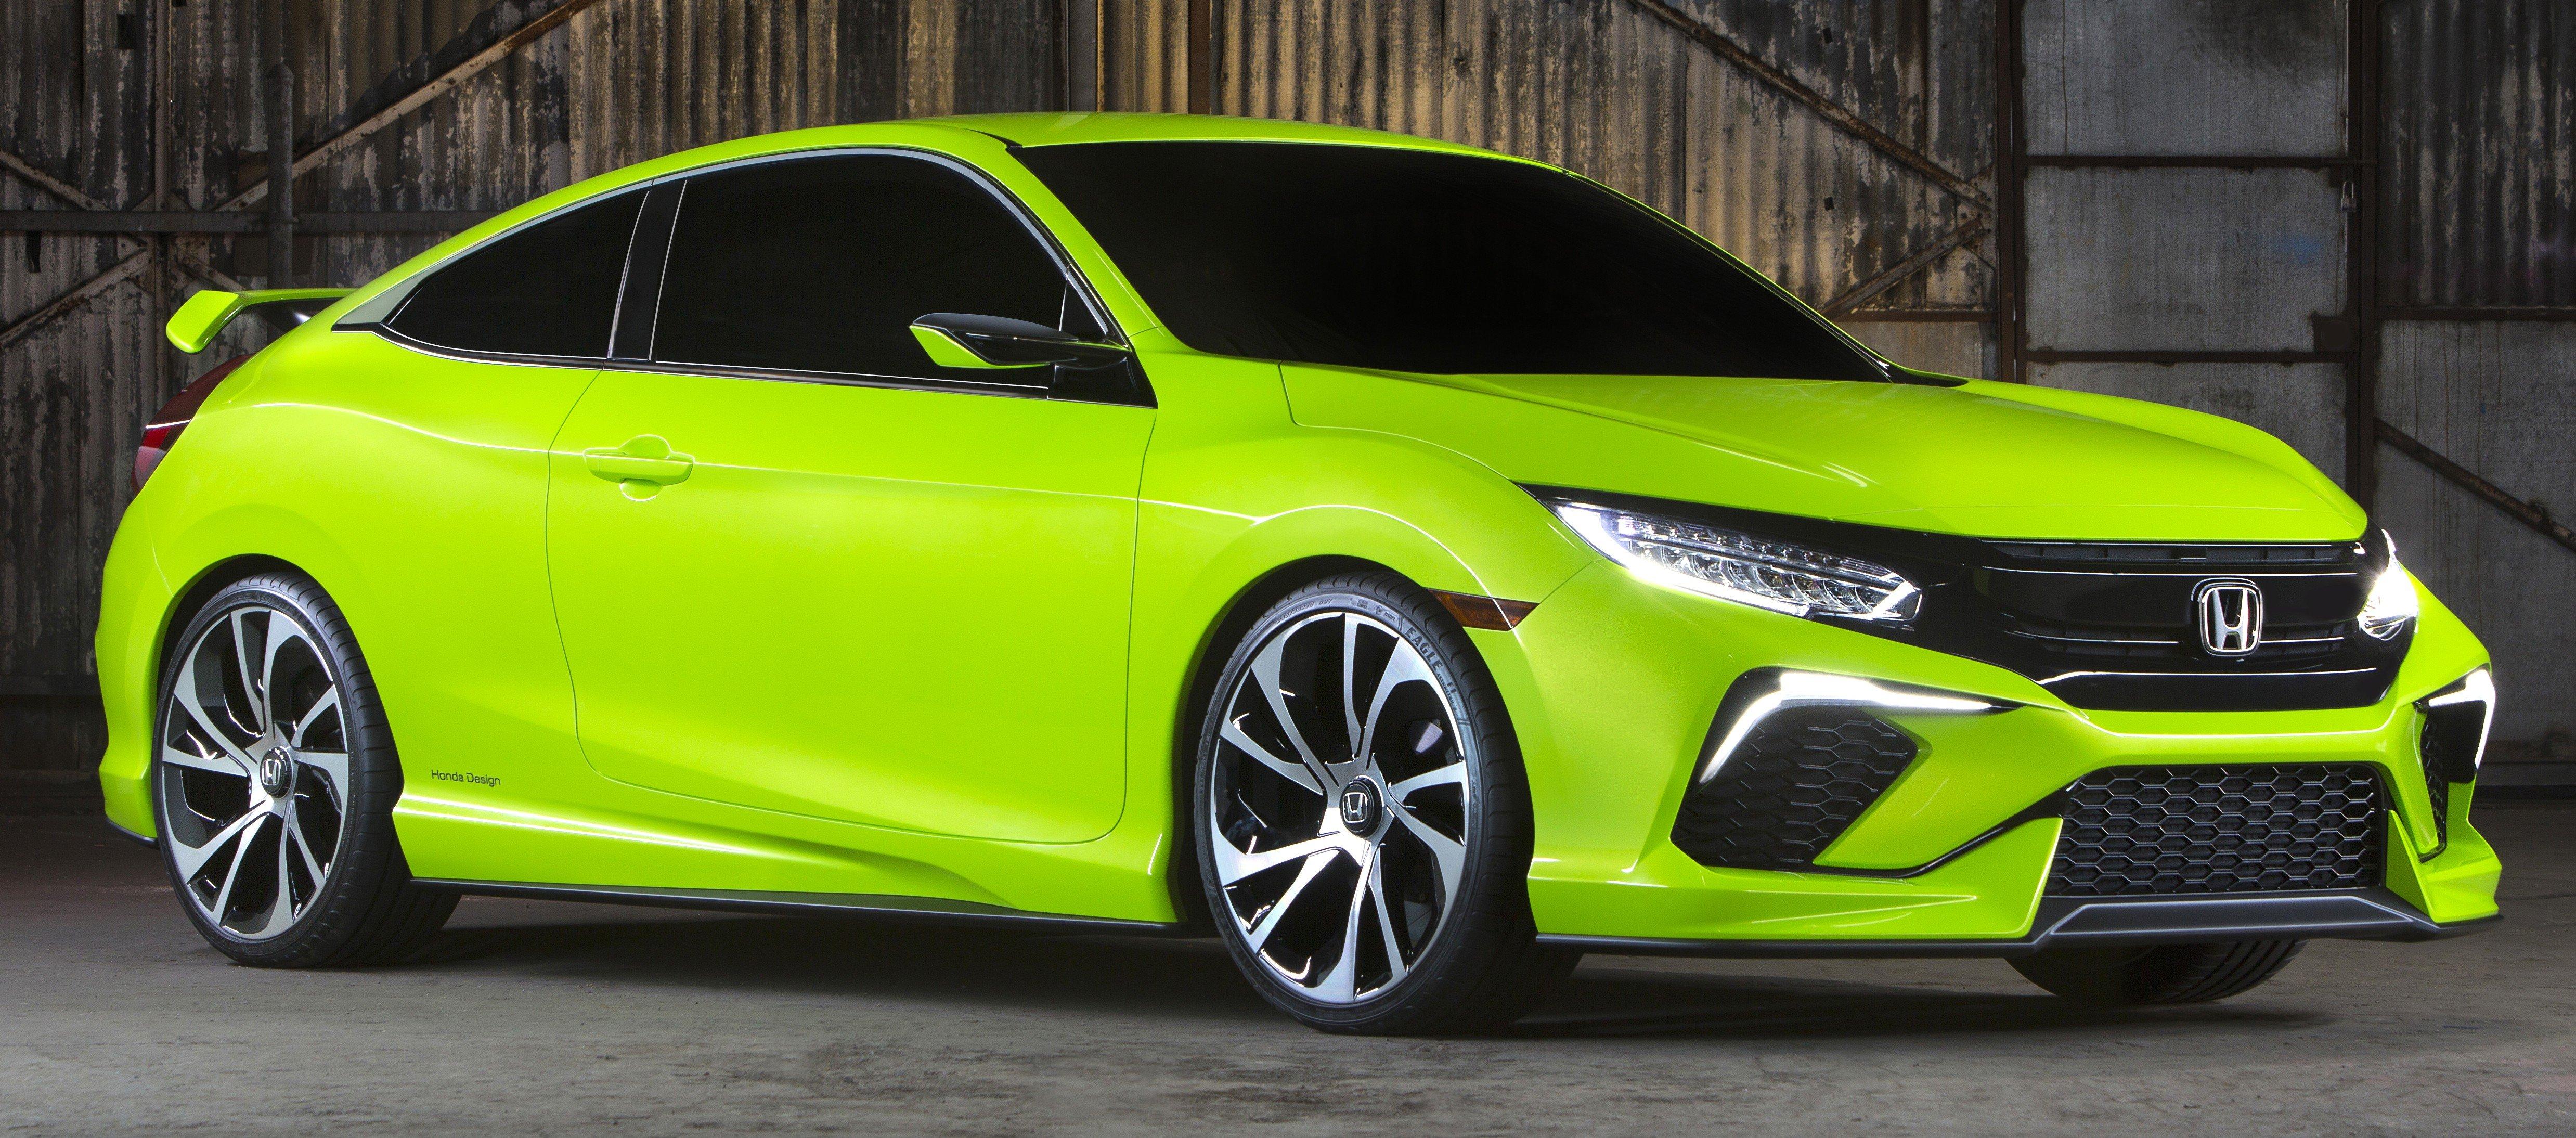 Aussie Home Loan Calculator >> Next-gen Honda Civic set for Australian debut in 2016